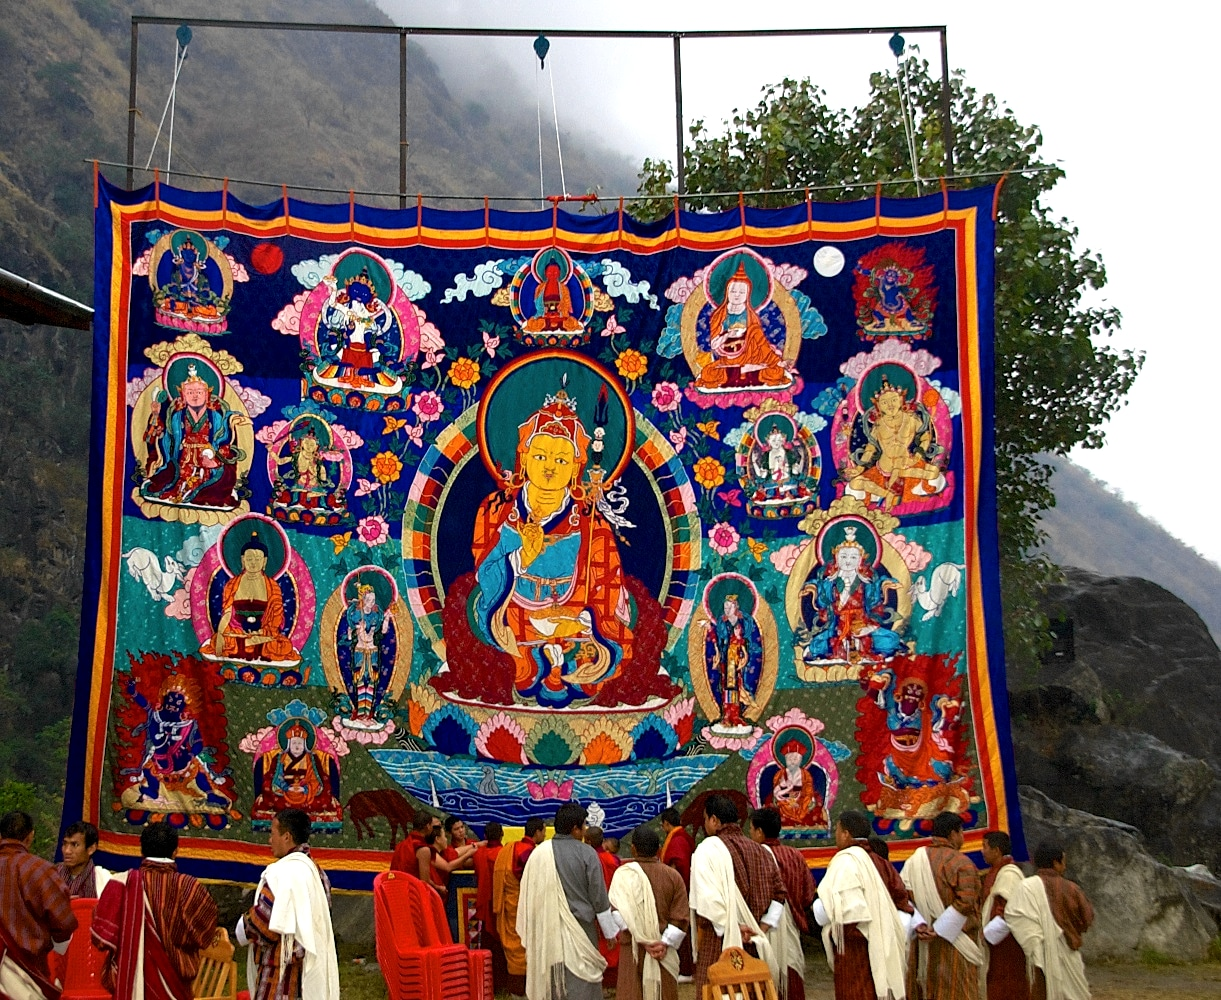 Guru Rinpoche Throngdrel ผ้าพระบฎรูปท่าน กูรูรินโปเช